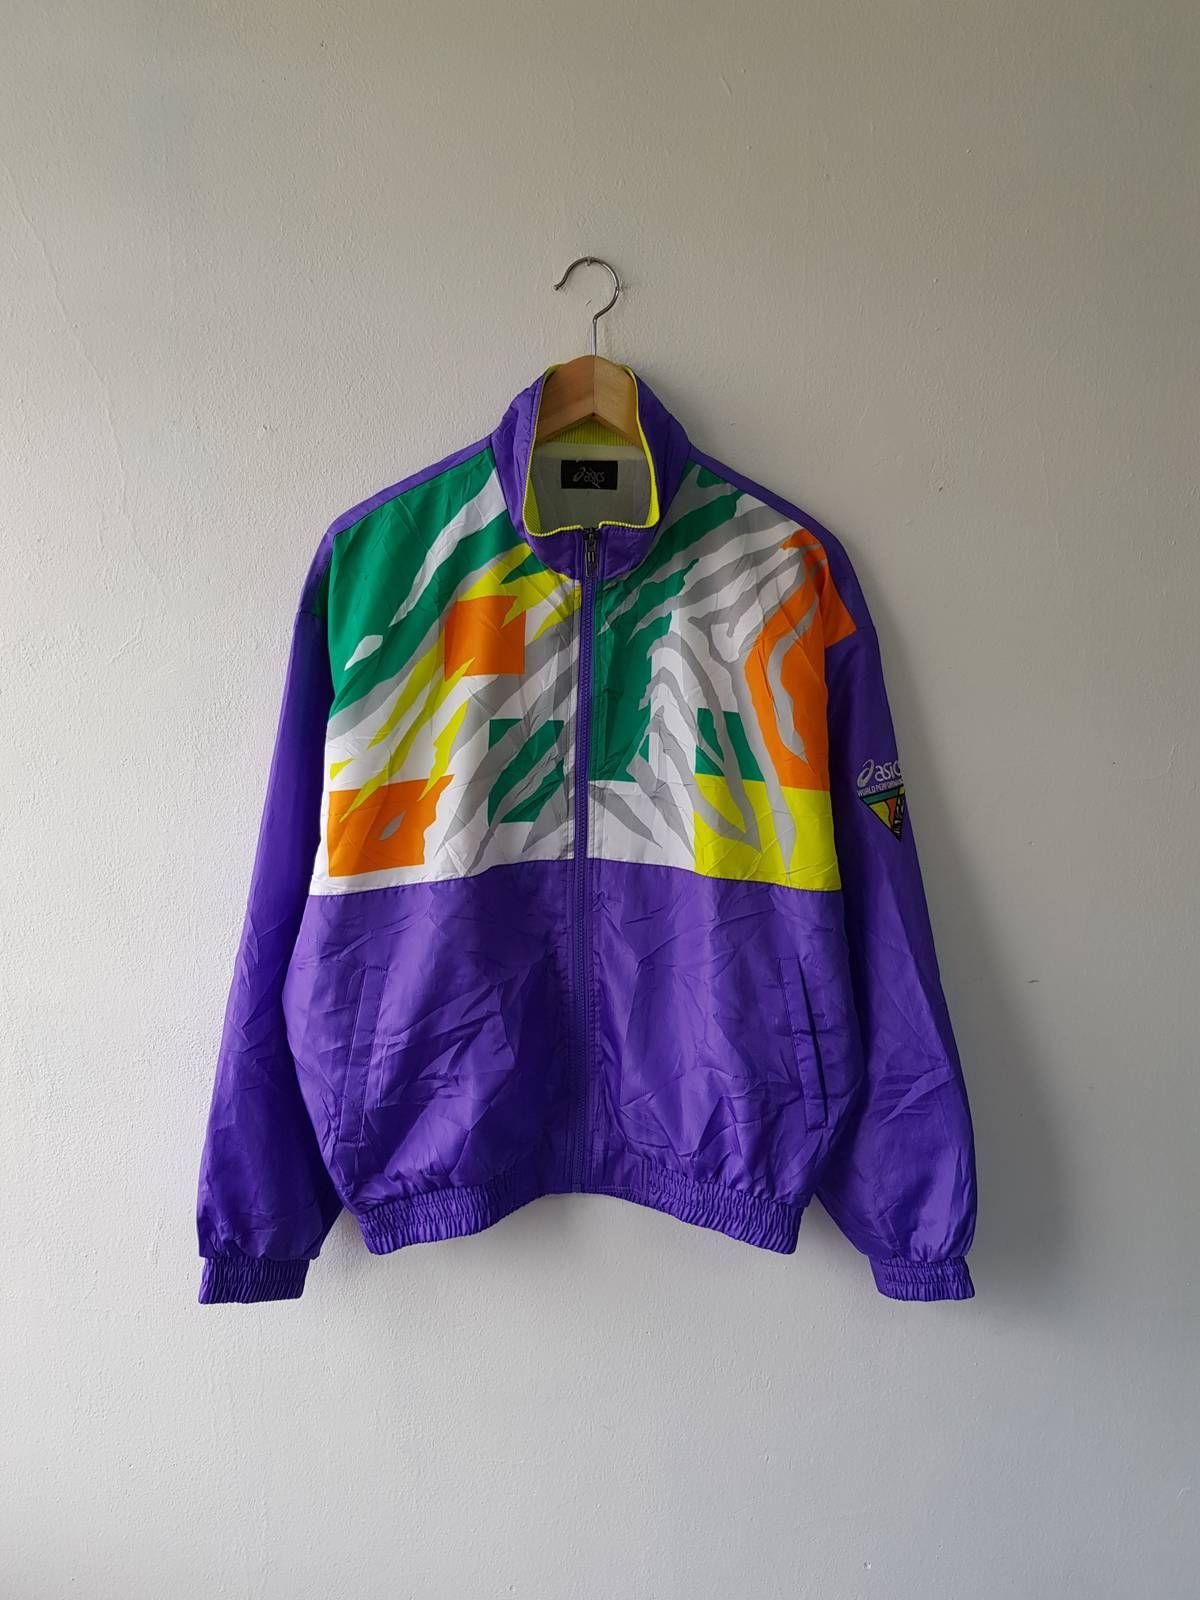 Buy Asics Vintage 90s ASICS Colorful Lightweight Windbreaker ...